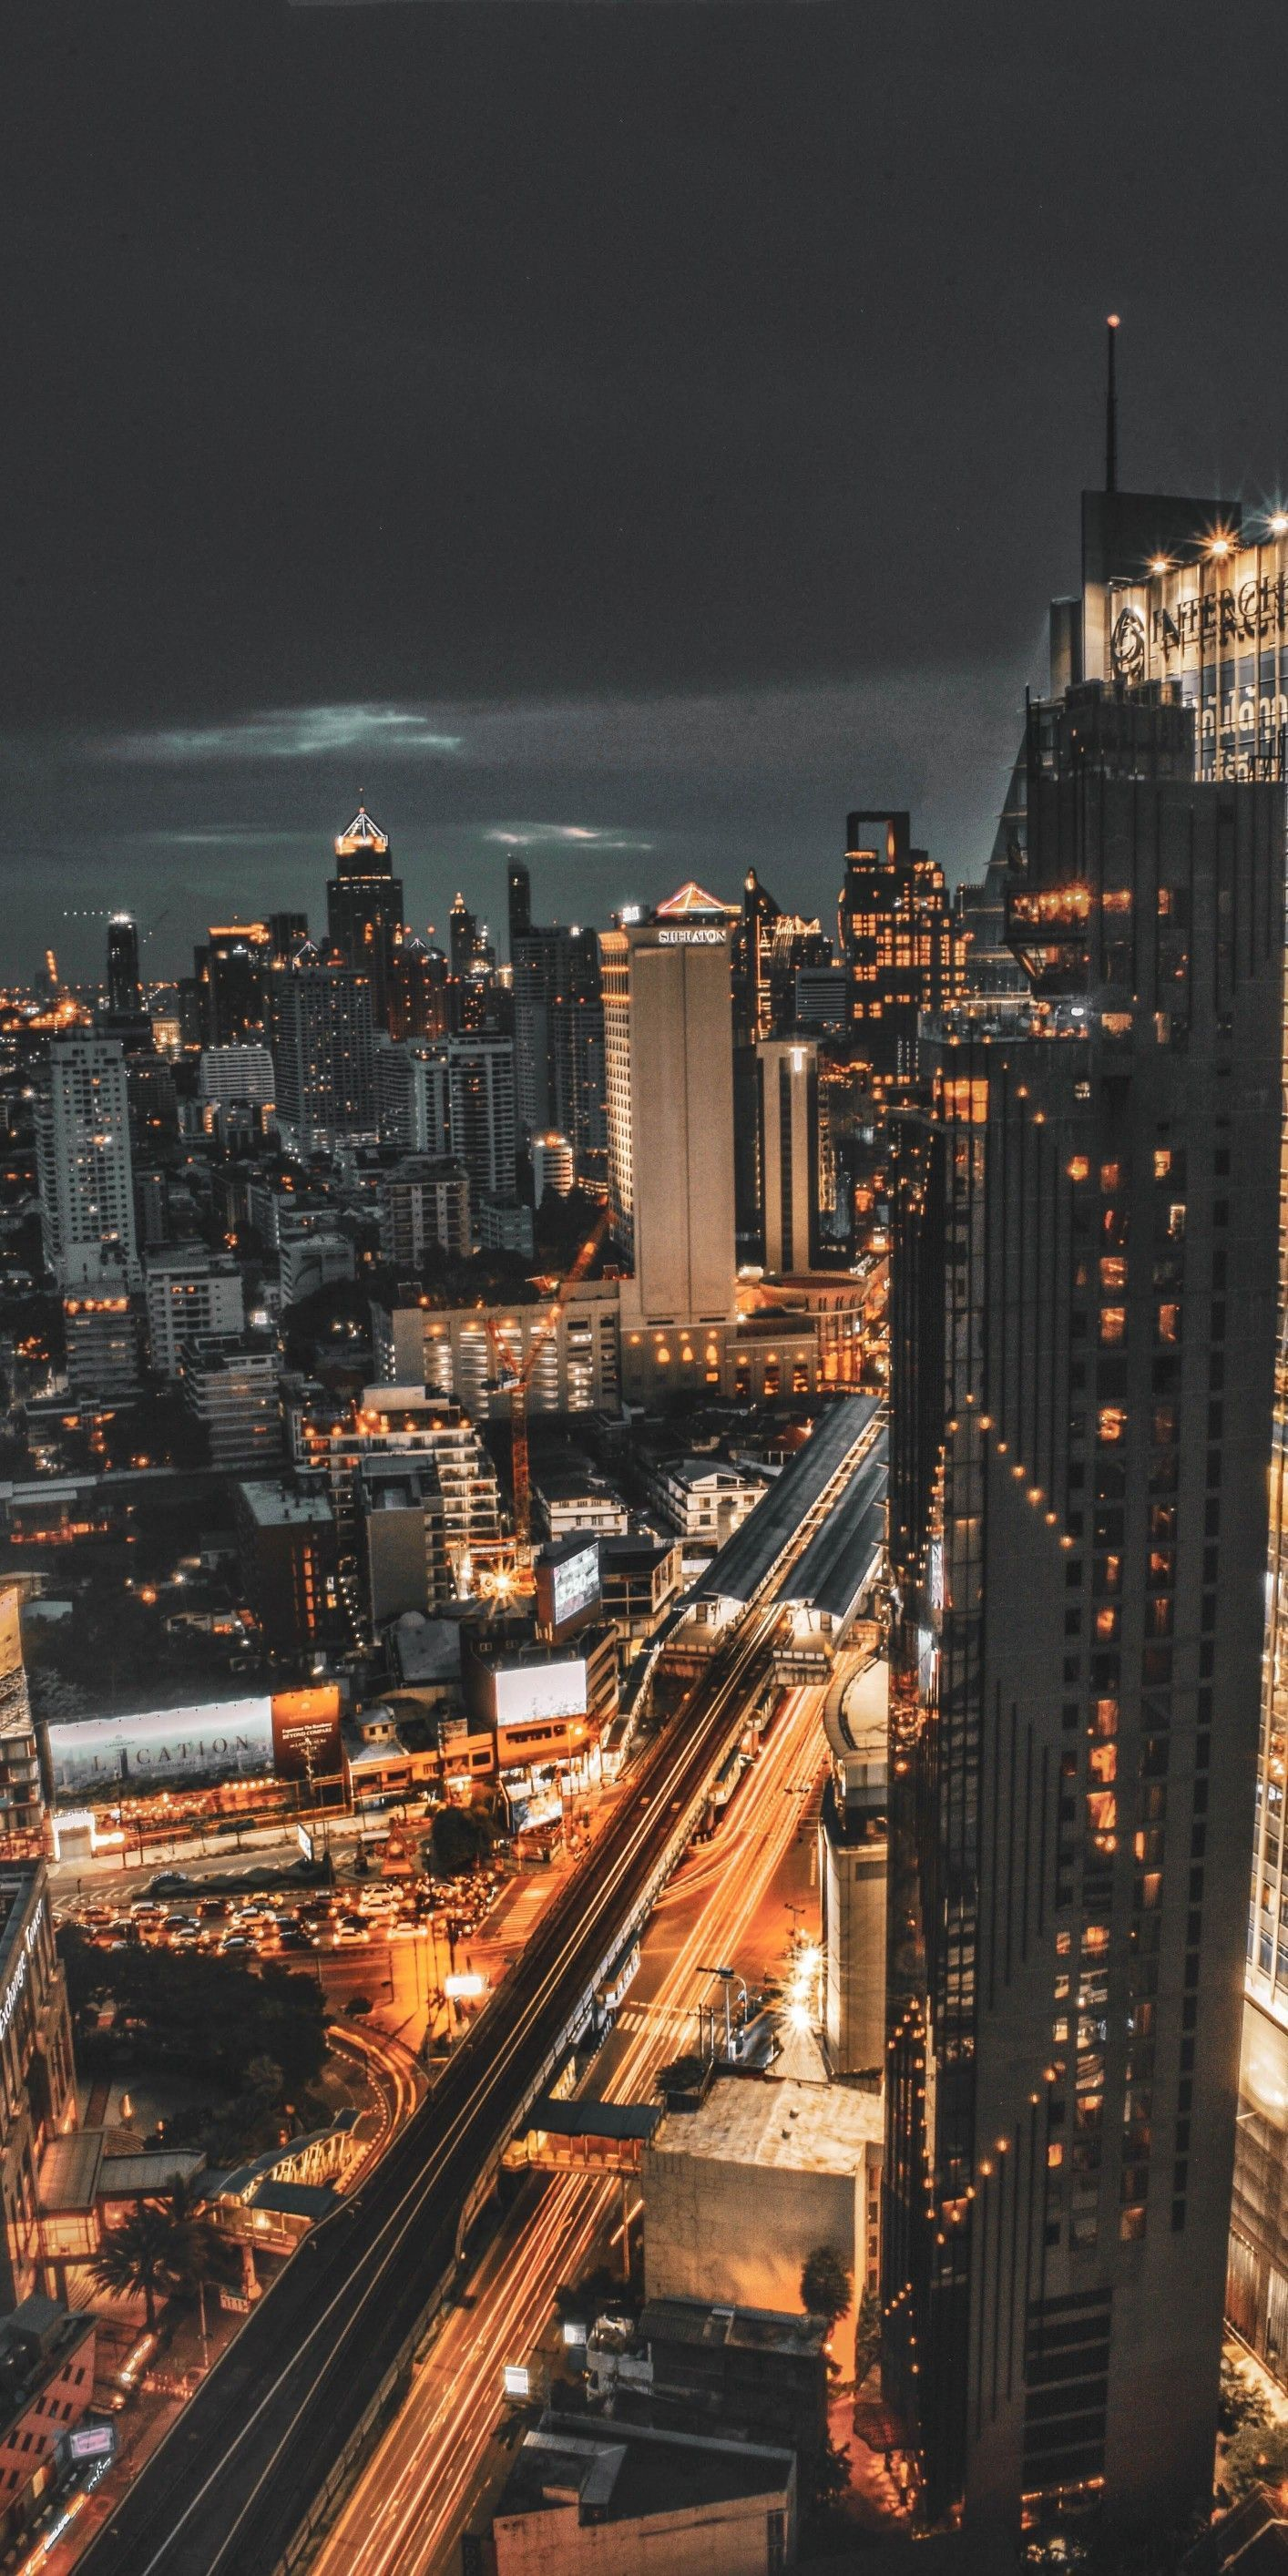 Aesthetic Ultra Hd Lock Screen Iphone Wallpapers 4k In 2020 City Wallpaper City Aesthetic City Iphone Wallpaper